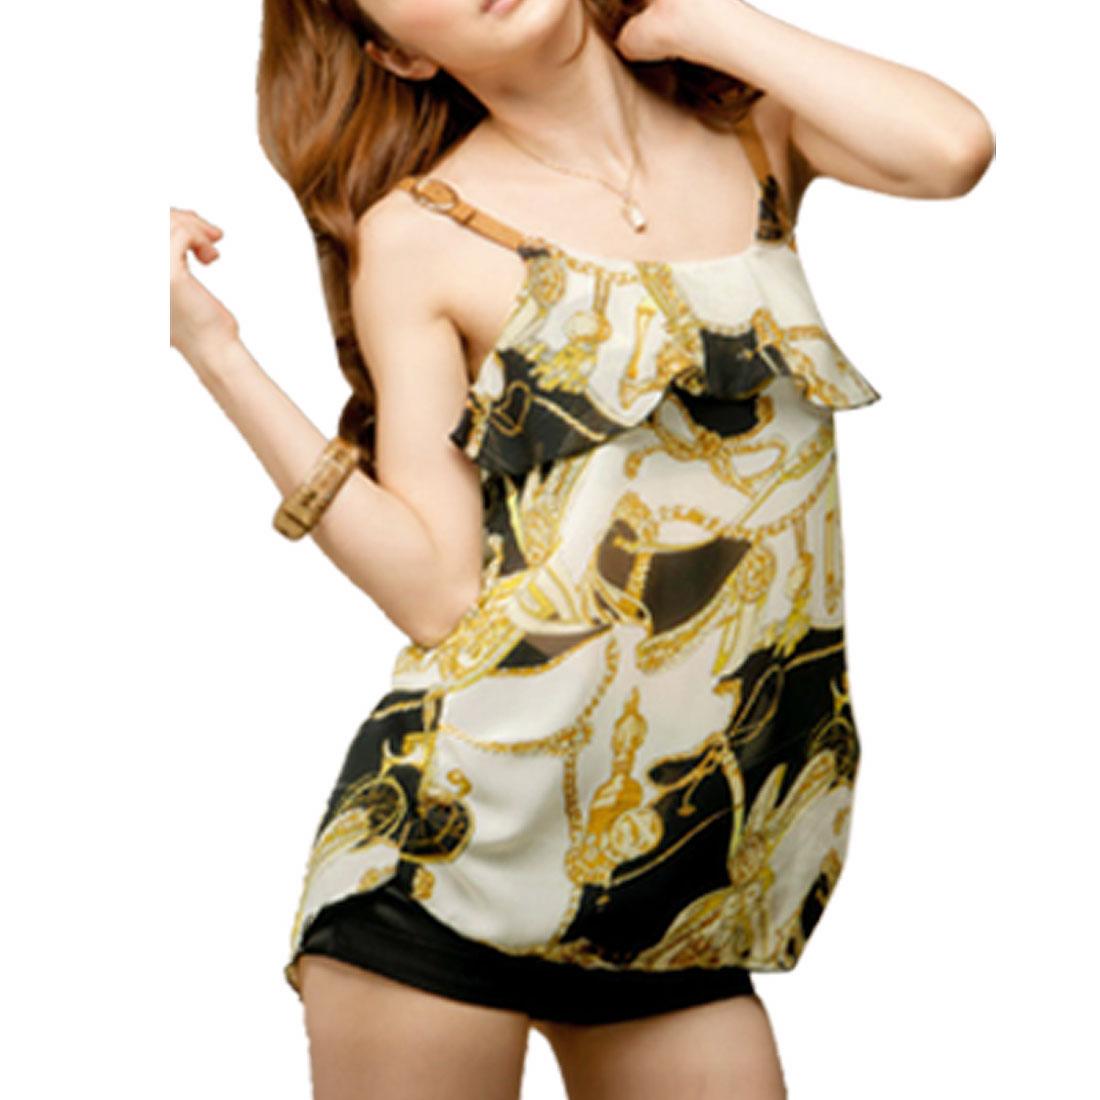 Brown Strap Ruffled Hem Chiffon Tank Top XS for Lady